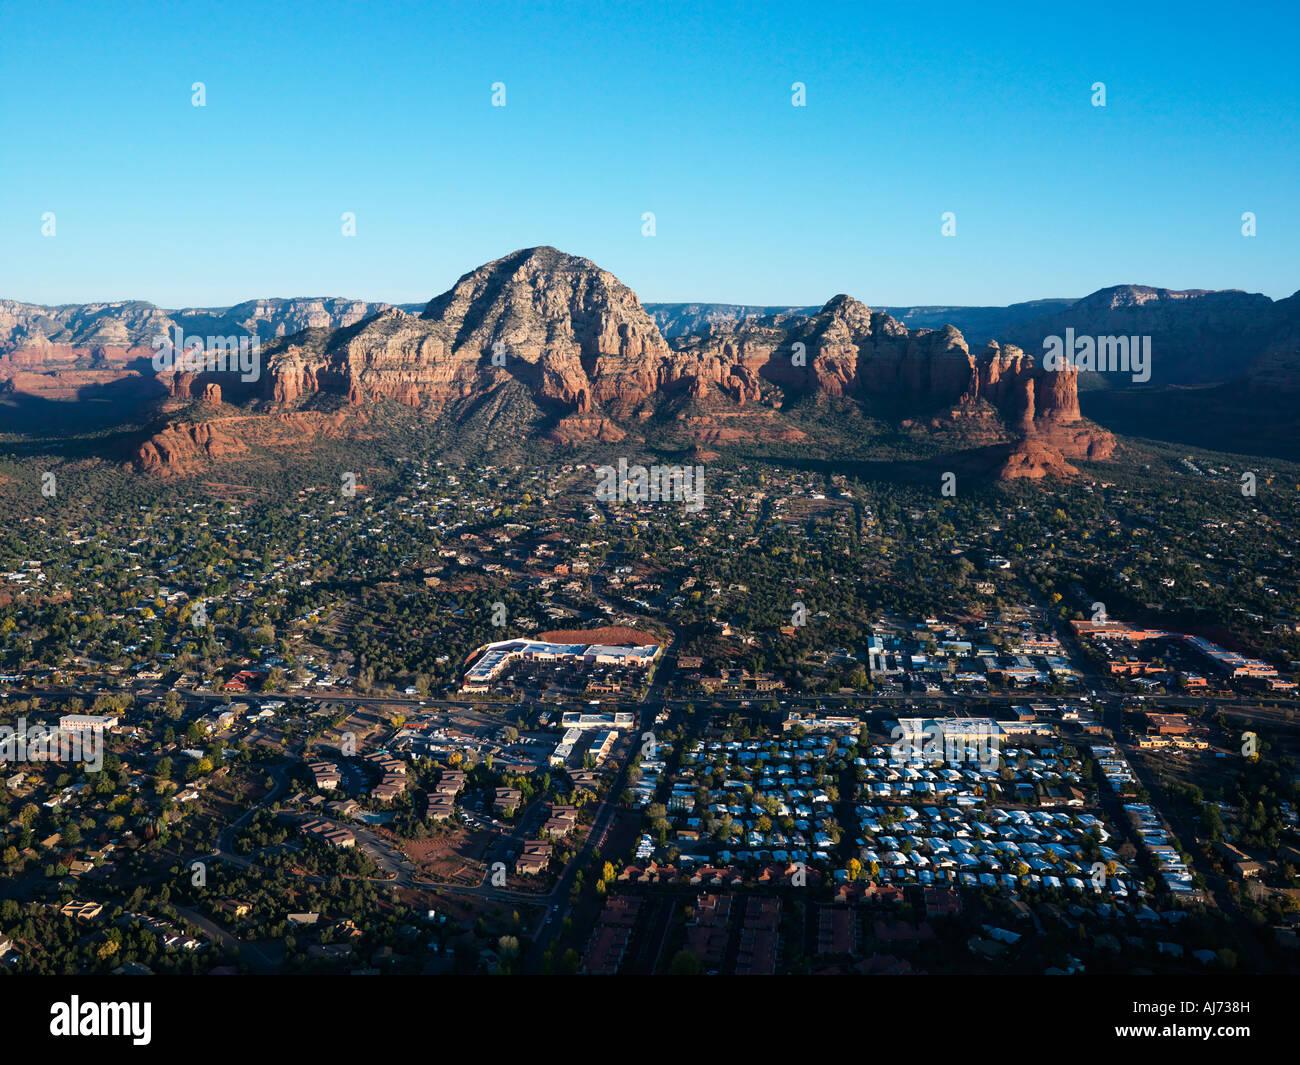 Aerial view of Sedona Arizona with landforms - Stock Image